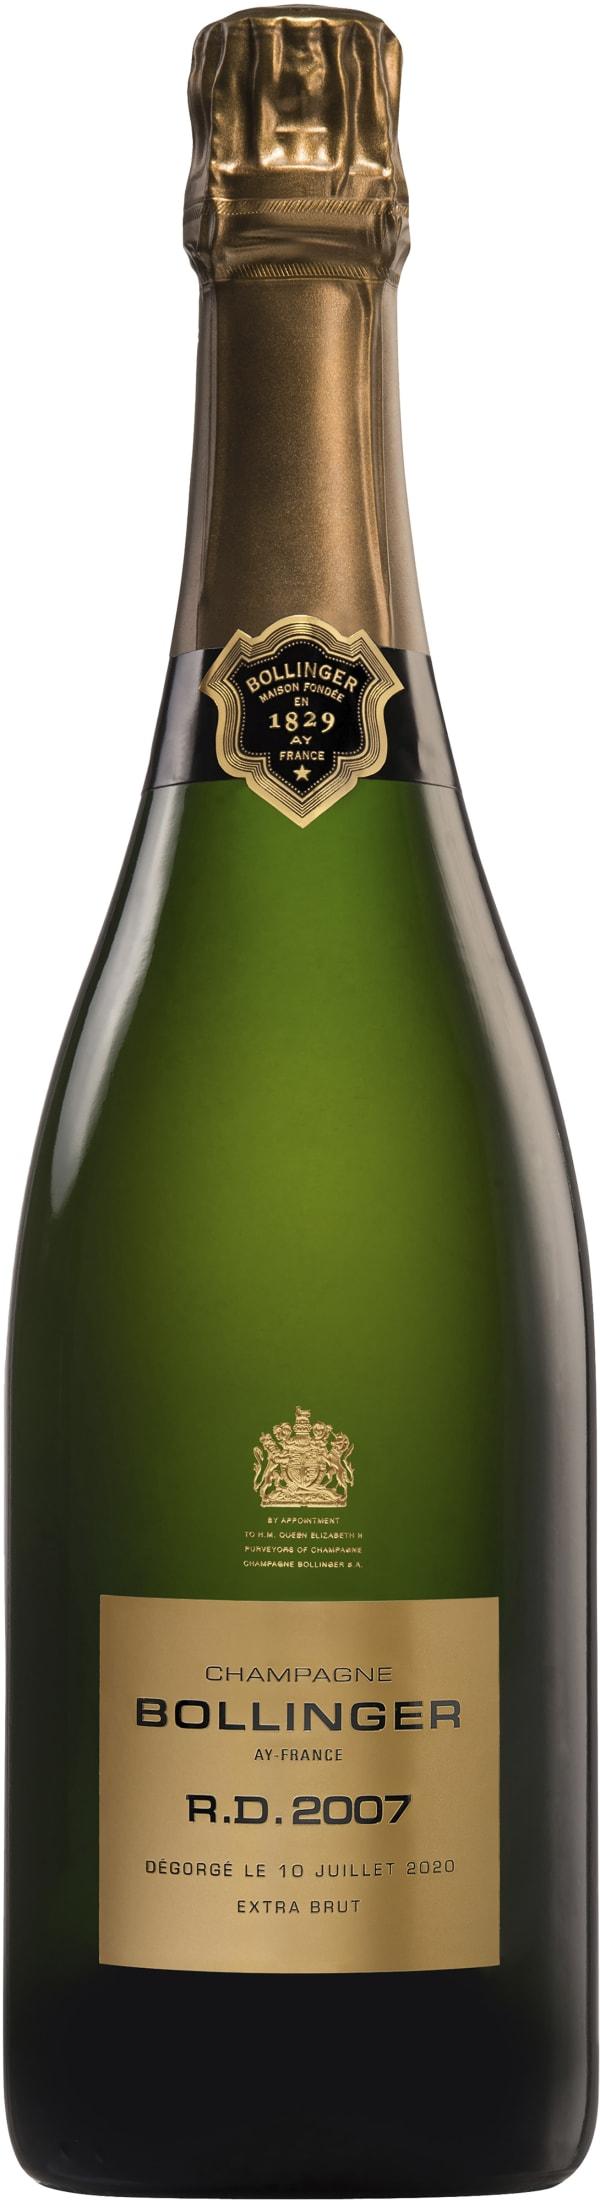 Bollinger R.D. Champagne Extra Brut 2007